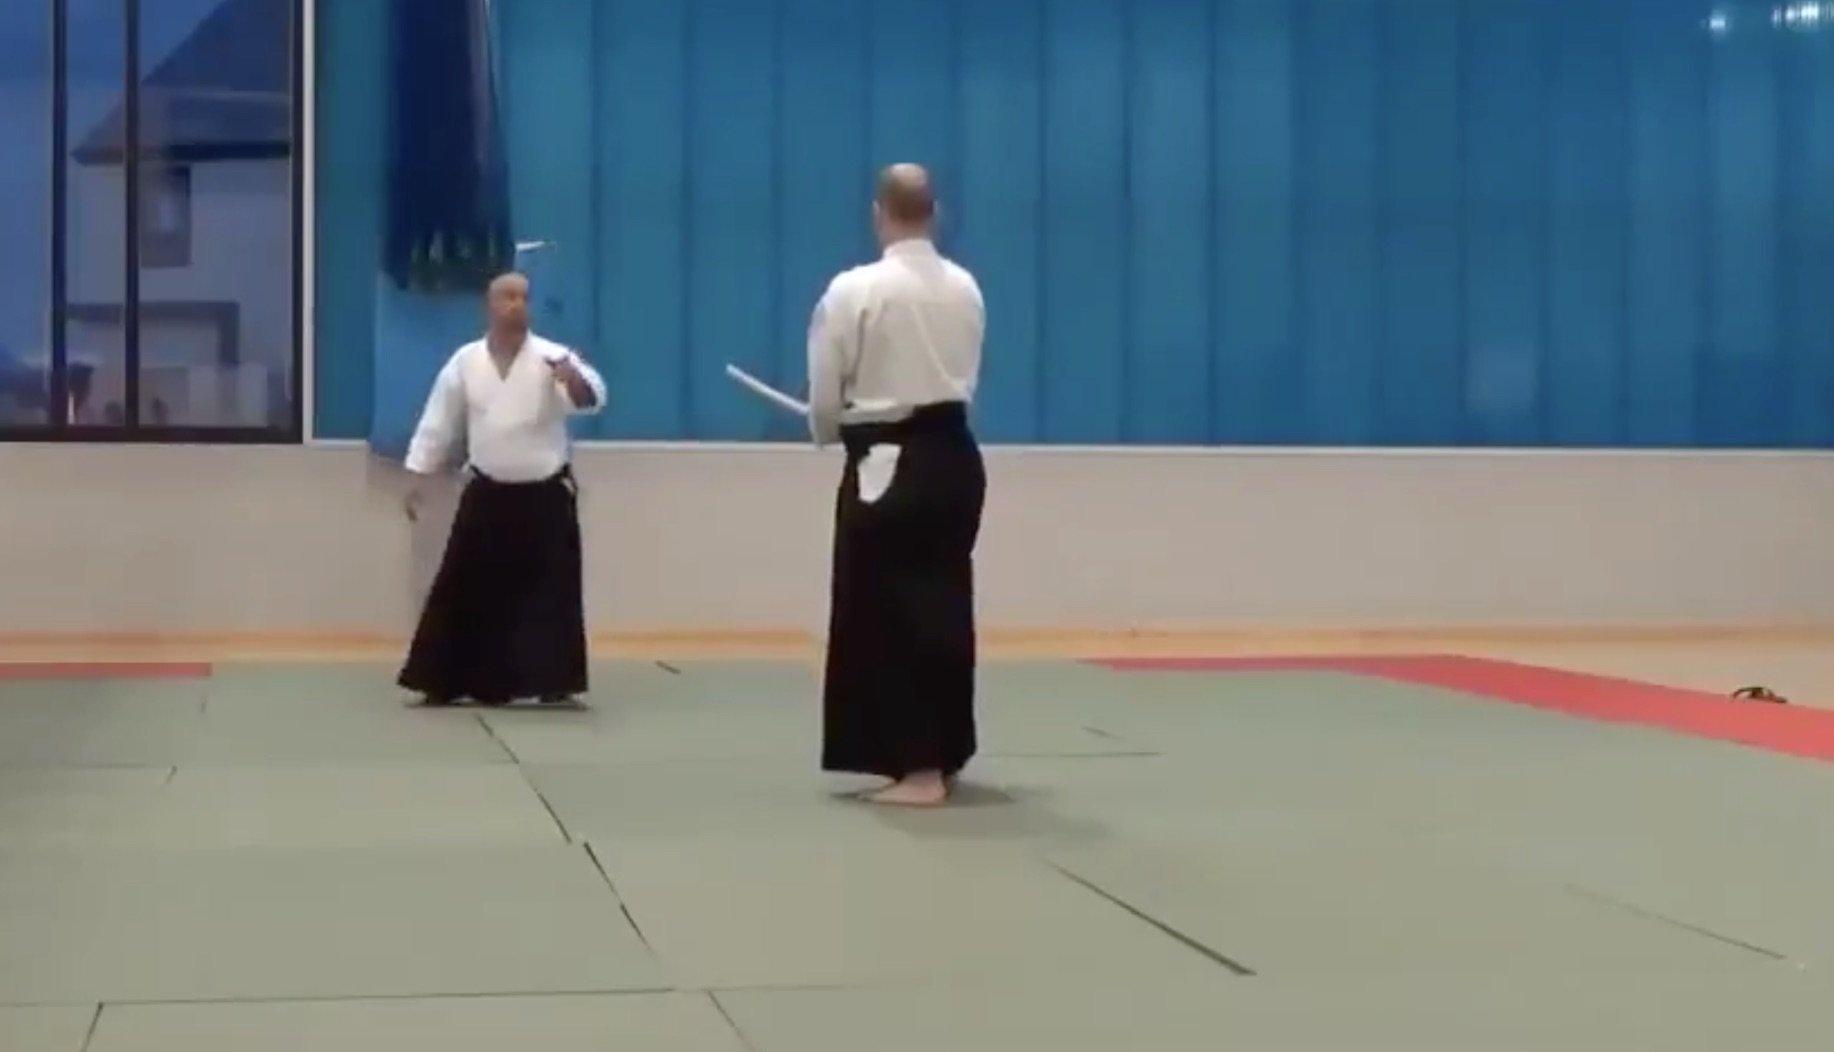 Aikido master shows off self-defense move.